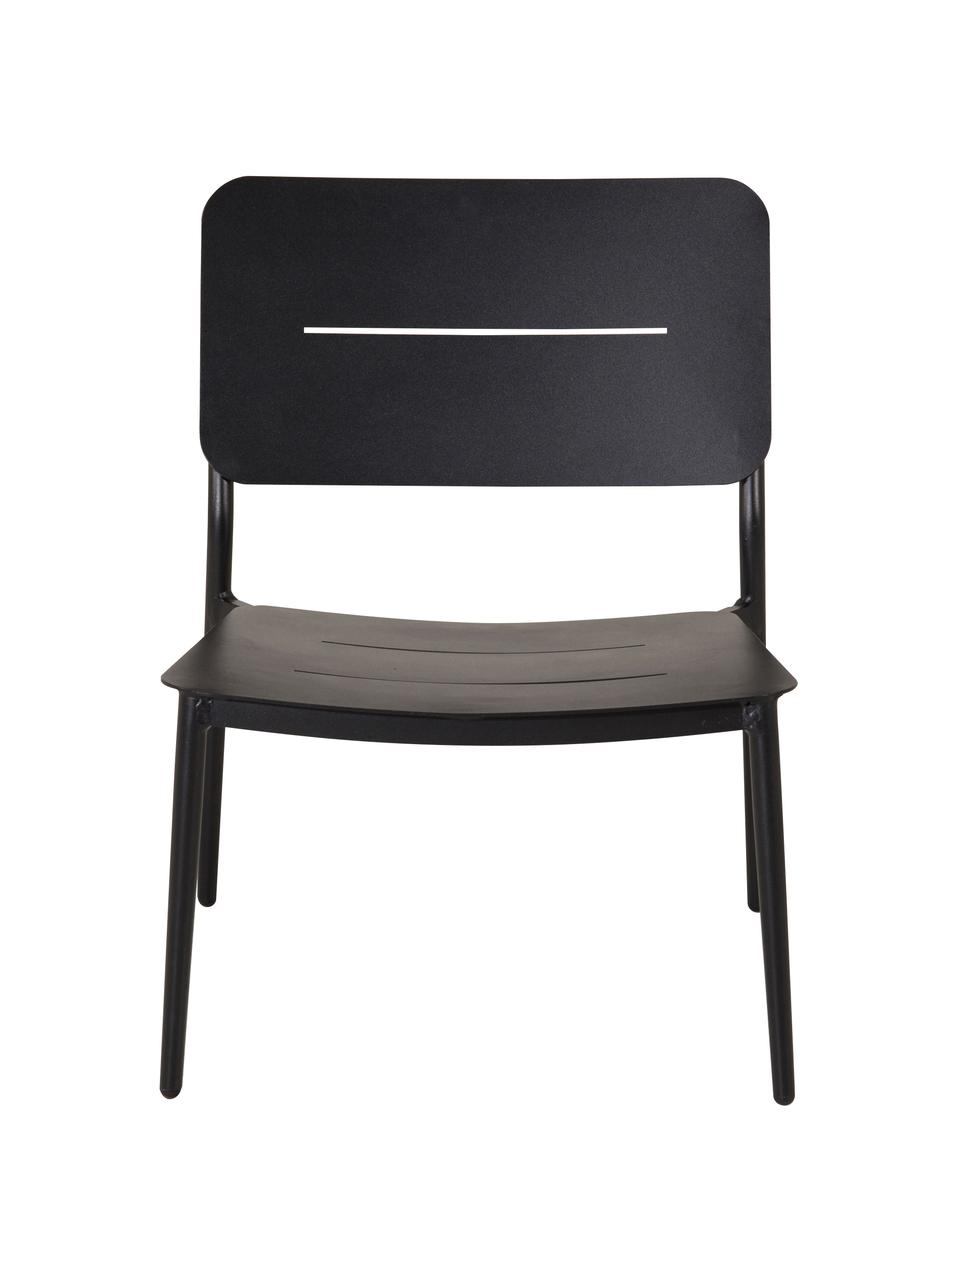 Metall-Lounge-Sessel Lina, Metall, lackiert, Schwarz, B 55 x T 59 cm